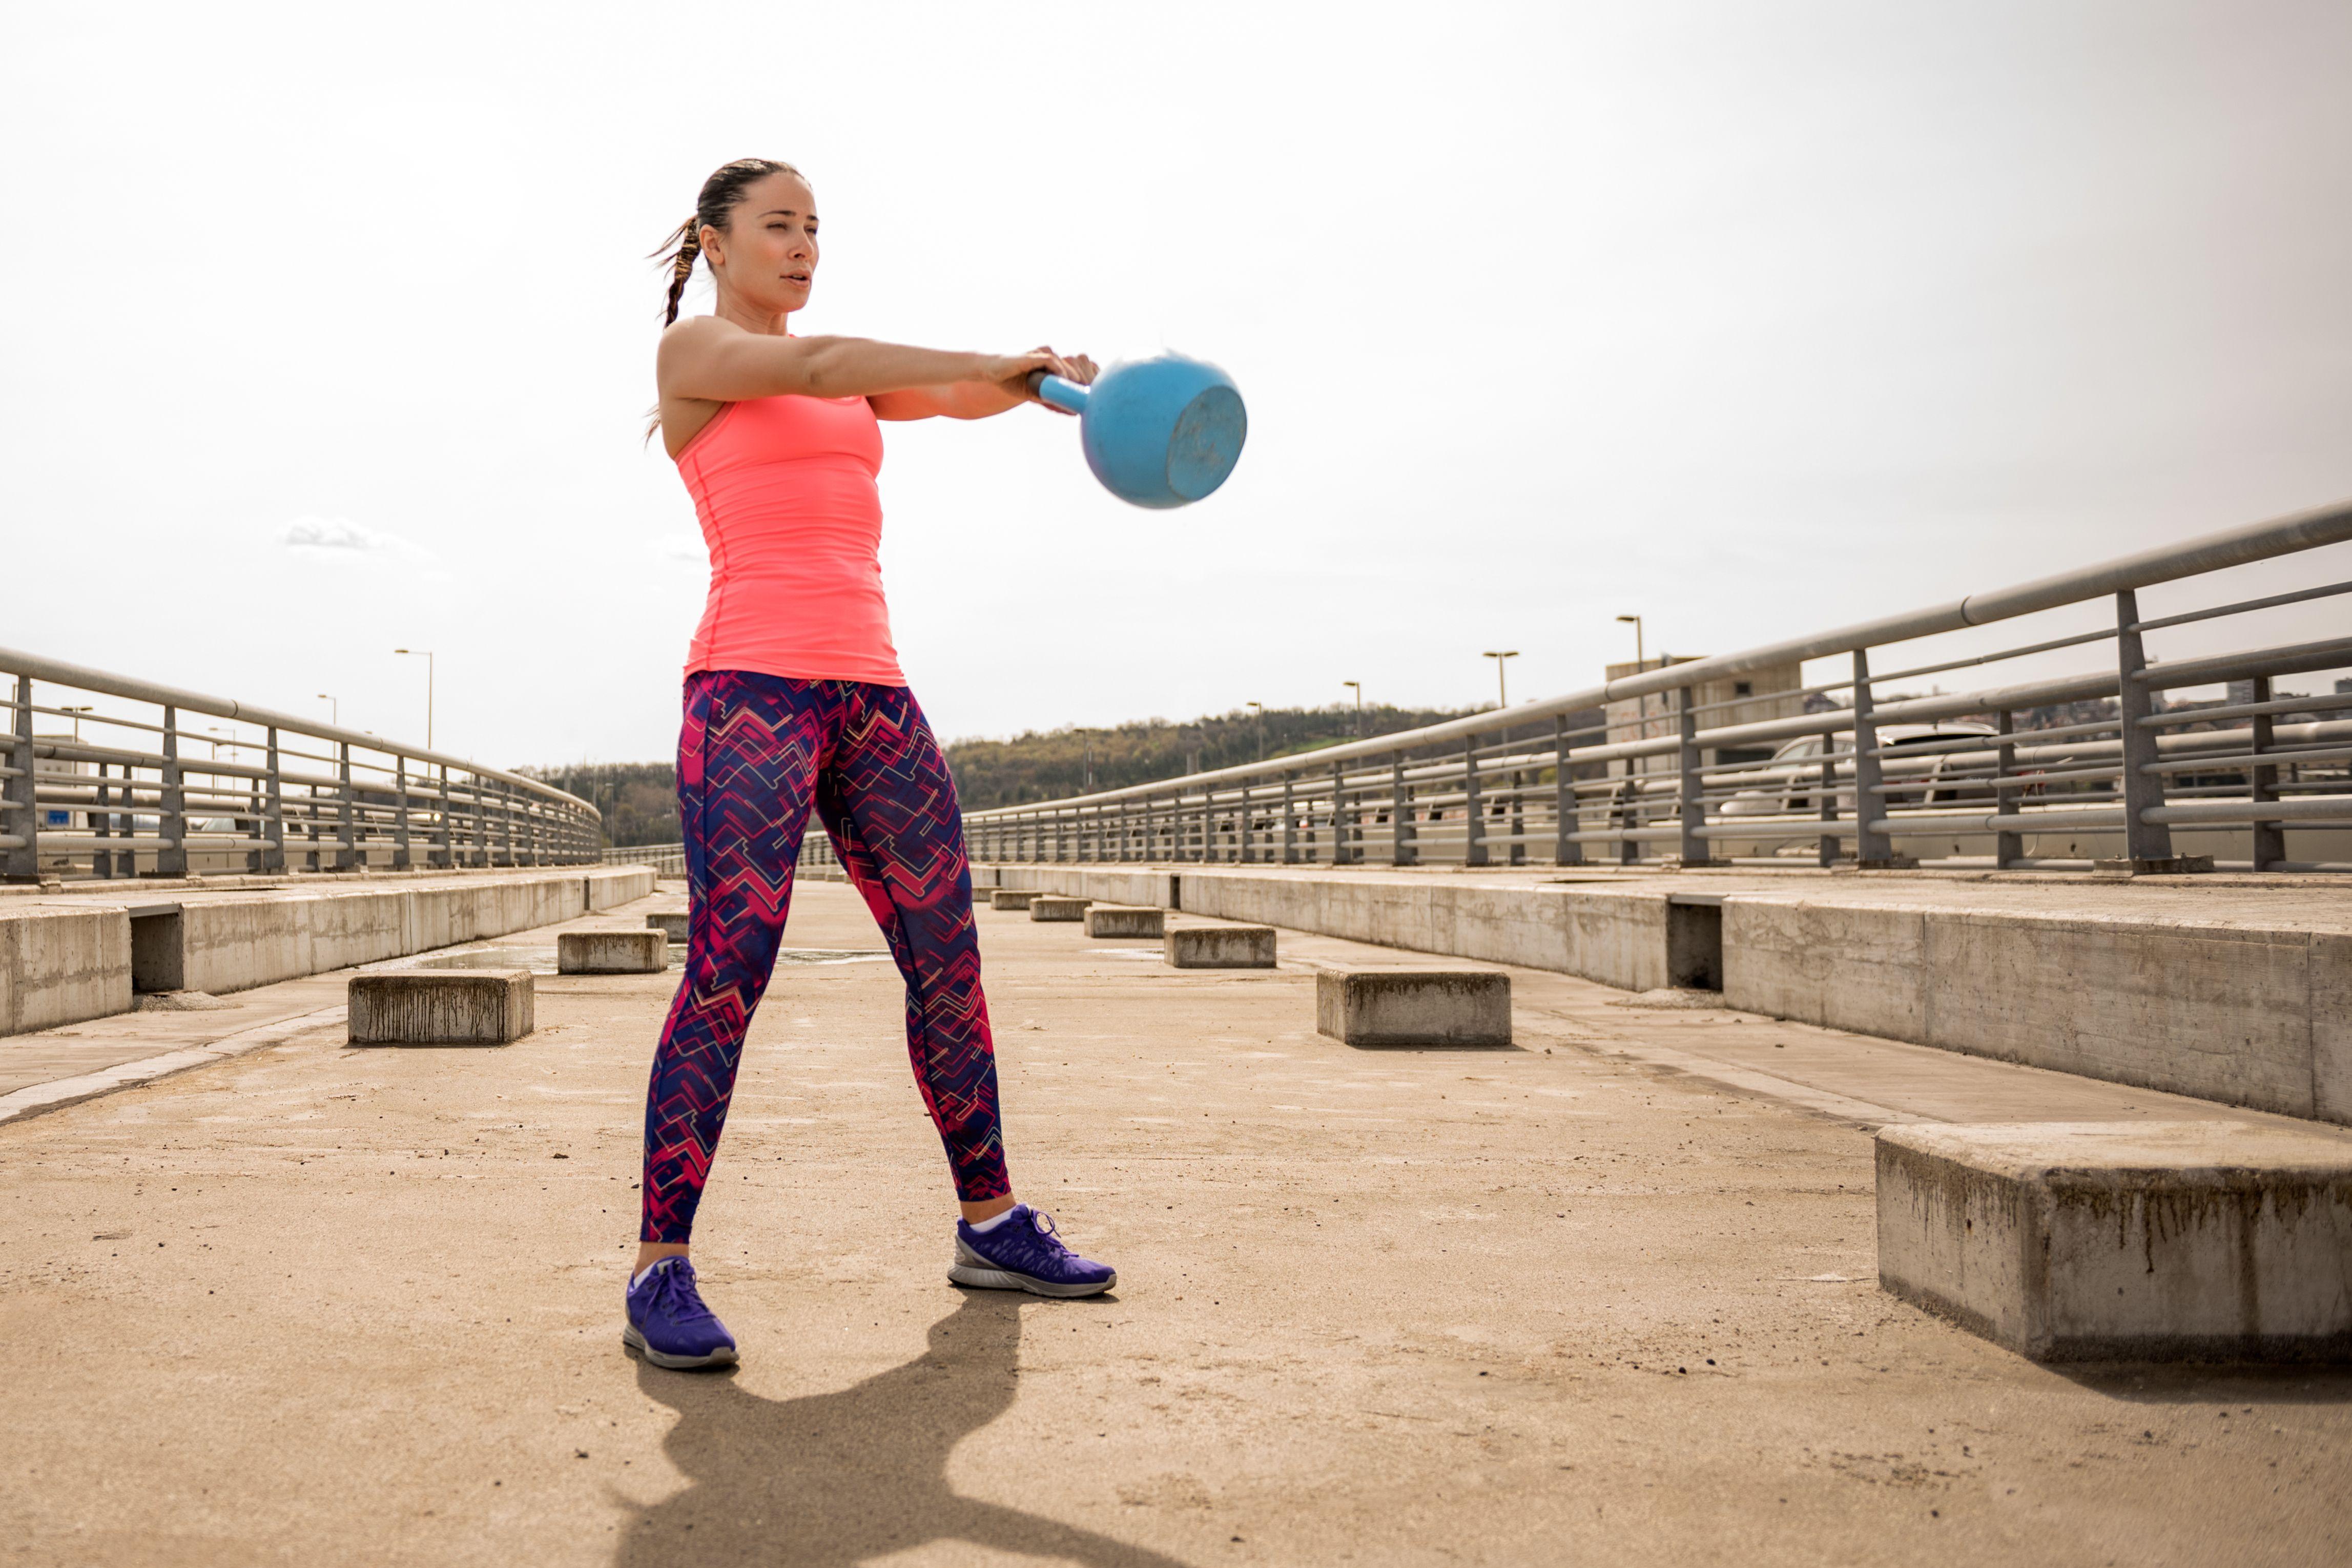 Kettlebell Exercises for Women: Your 16-Minute Full Body Workout